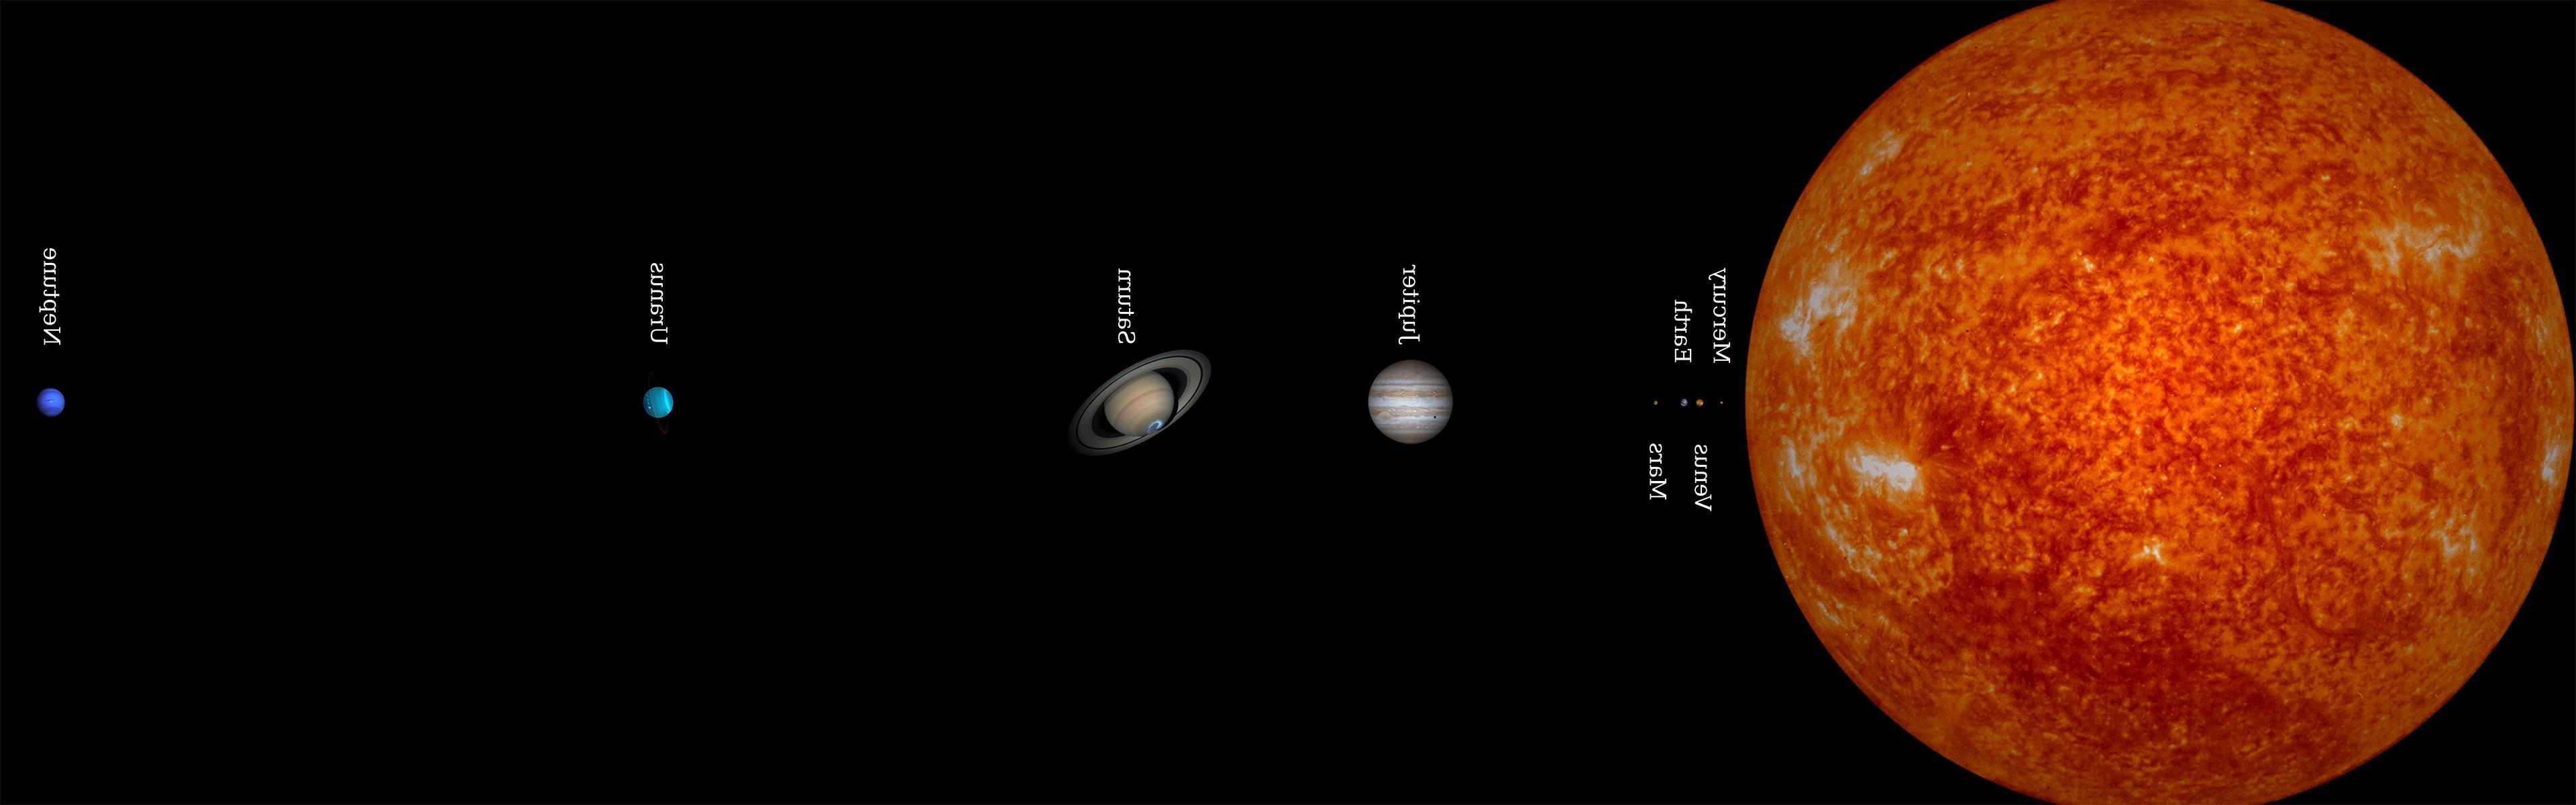 Space Solar System Planet Sun Mercury Venus Earth